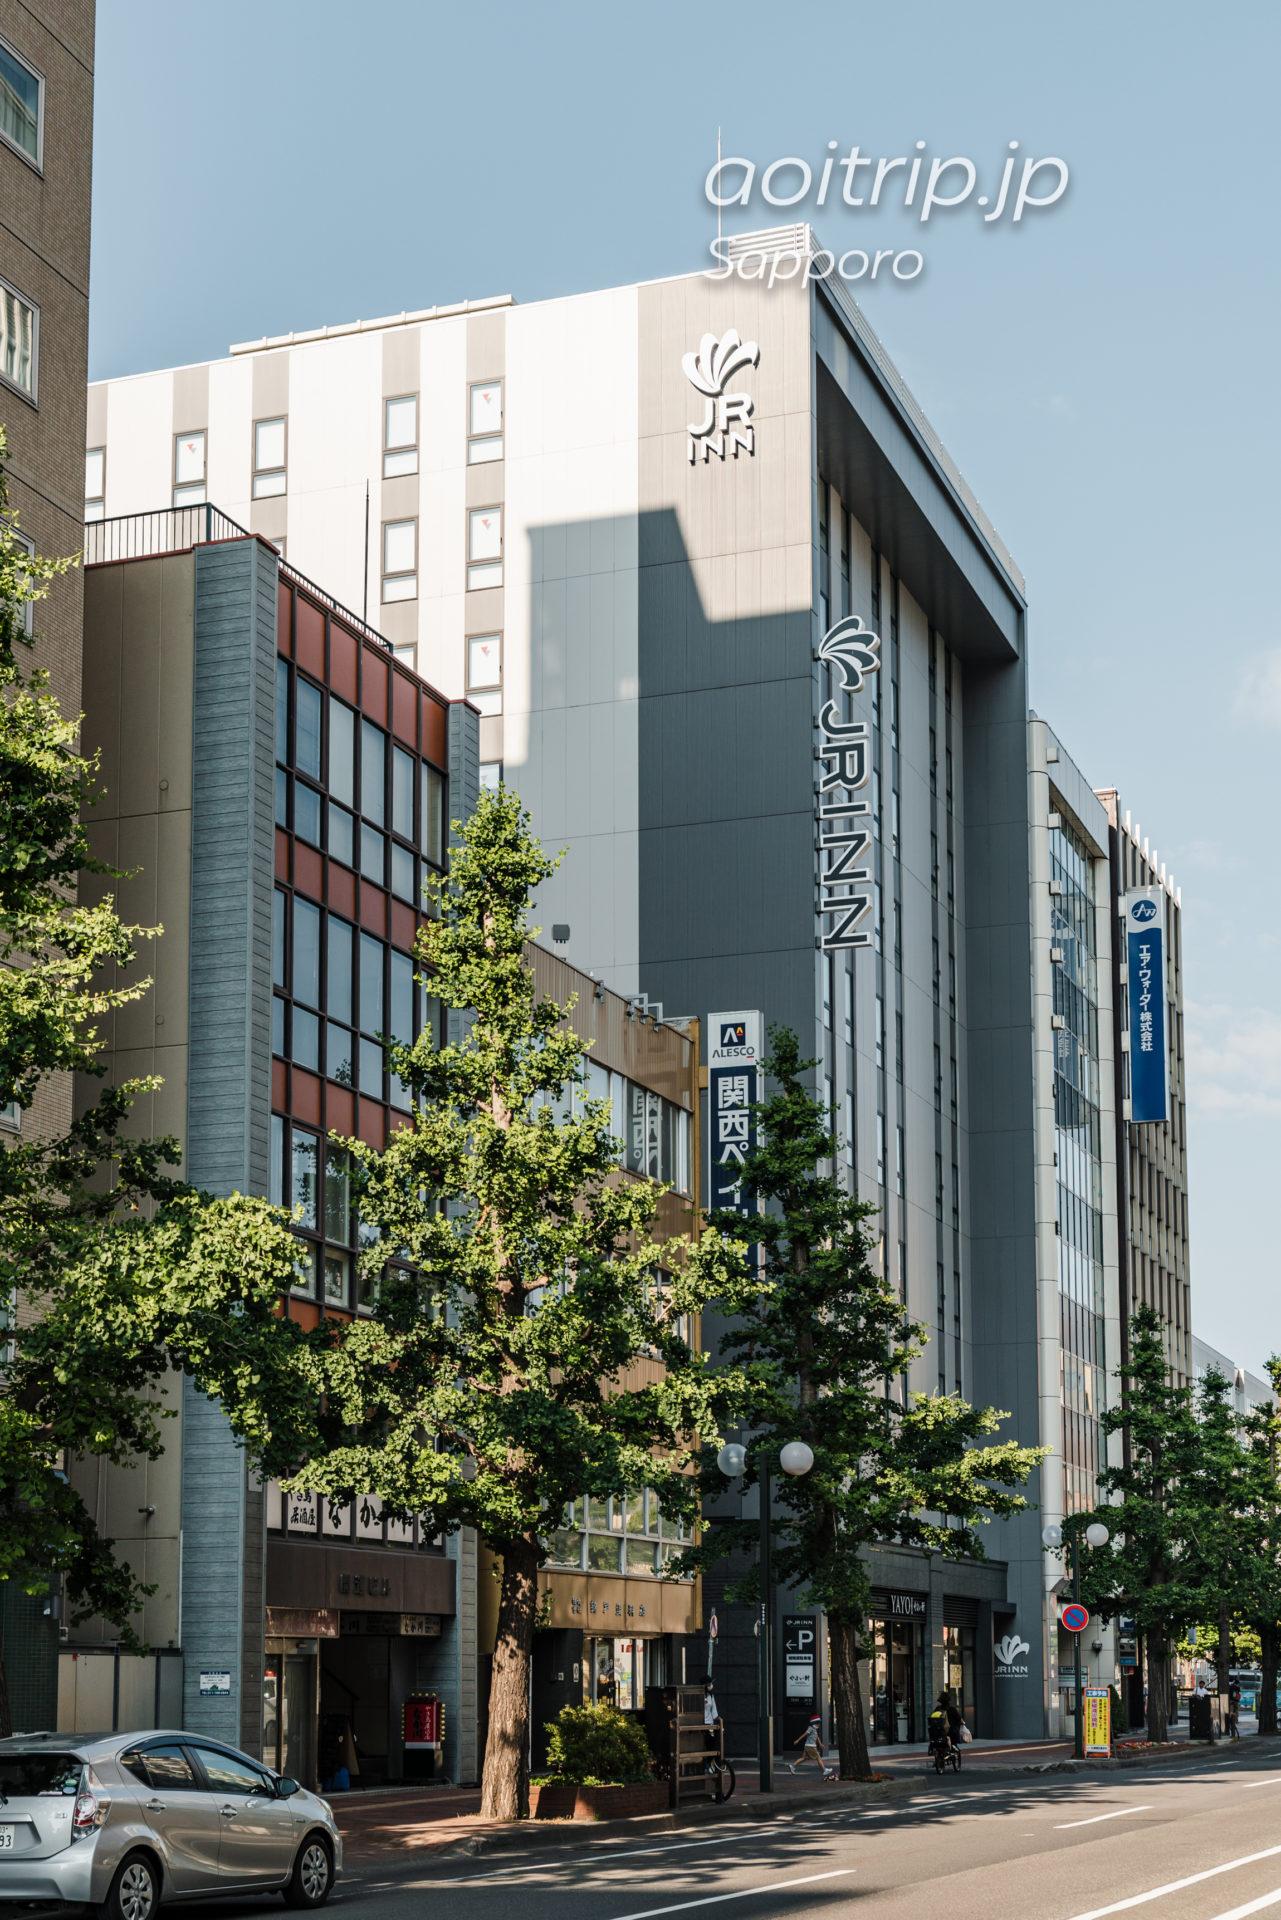 JRイン札幌駅南口 JR INN Sapporo